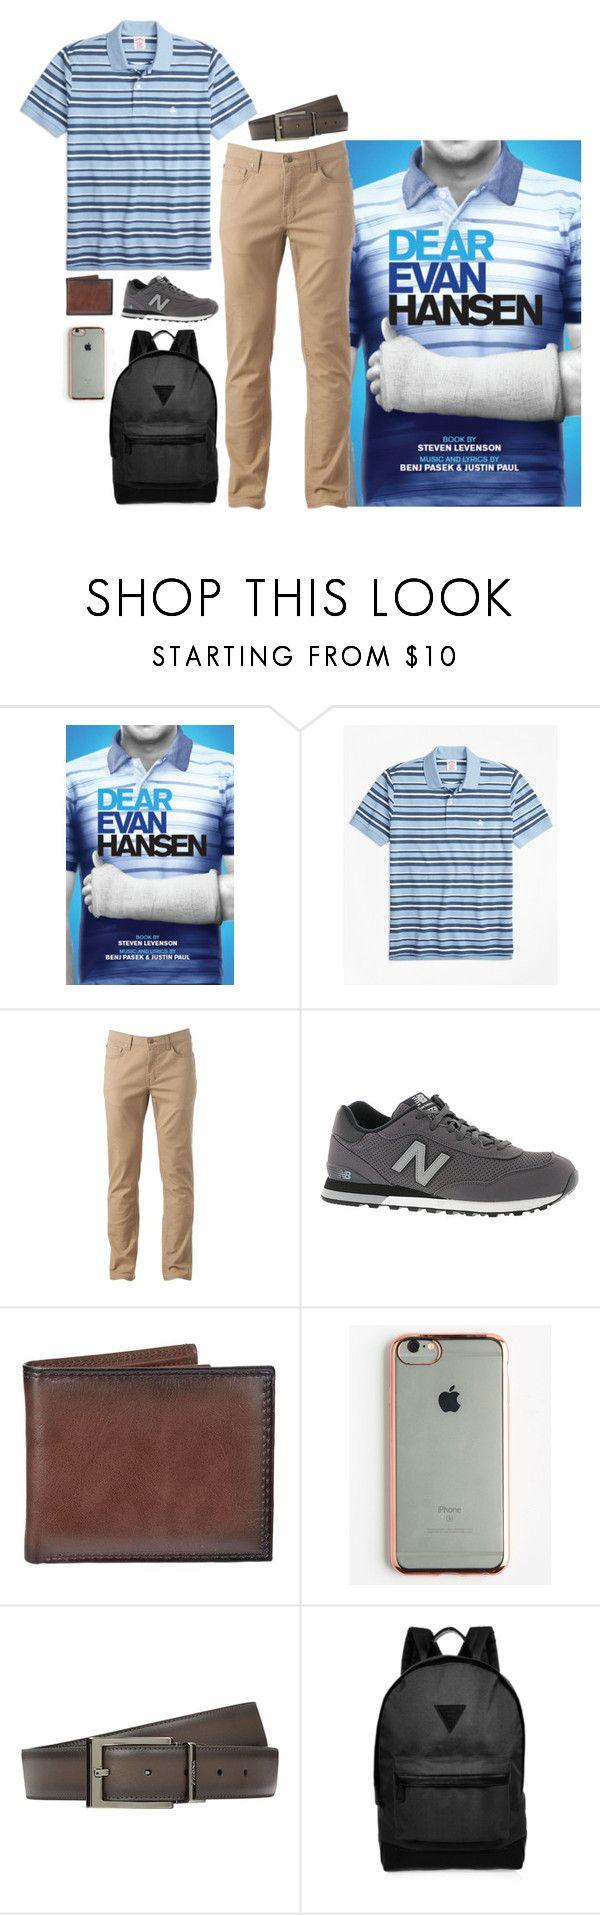 """Dear Evan Hansen"" by abbysm17es ❤ liked on Polyvore featuring Hansen, Brooks Brothers, Urban Pipeline, New Balance, Croft & Barrow, GabbaGoods, Zegna, River Island, men's fashion and menswear"